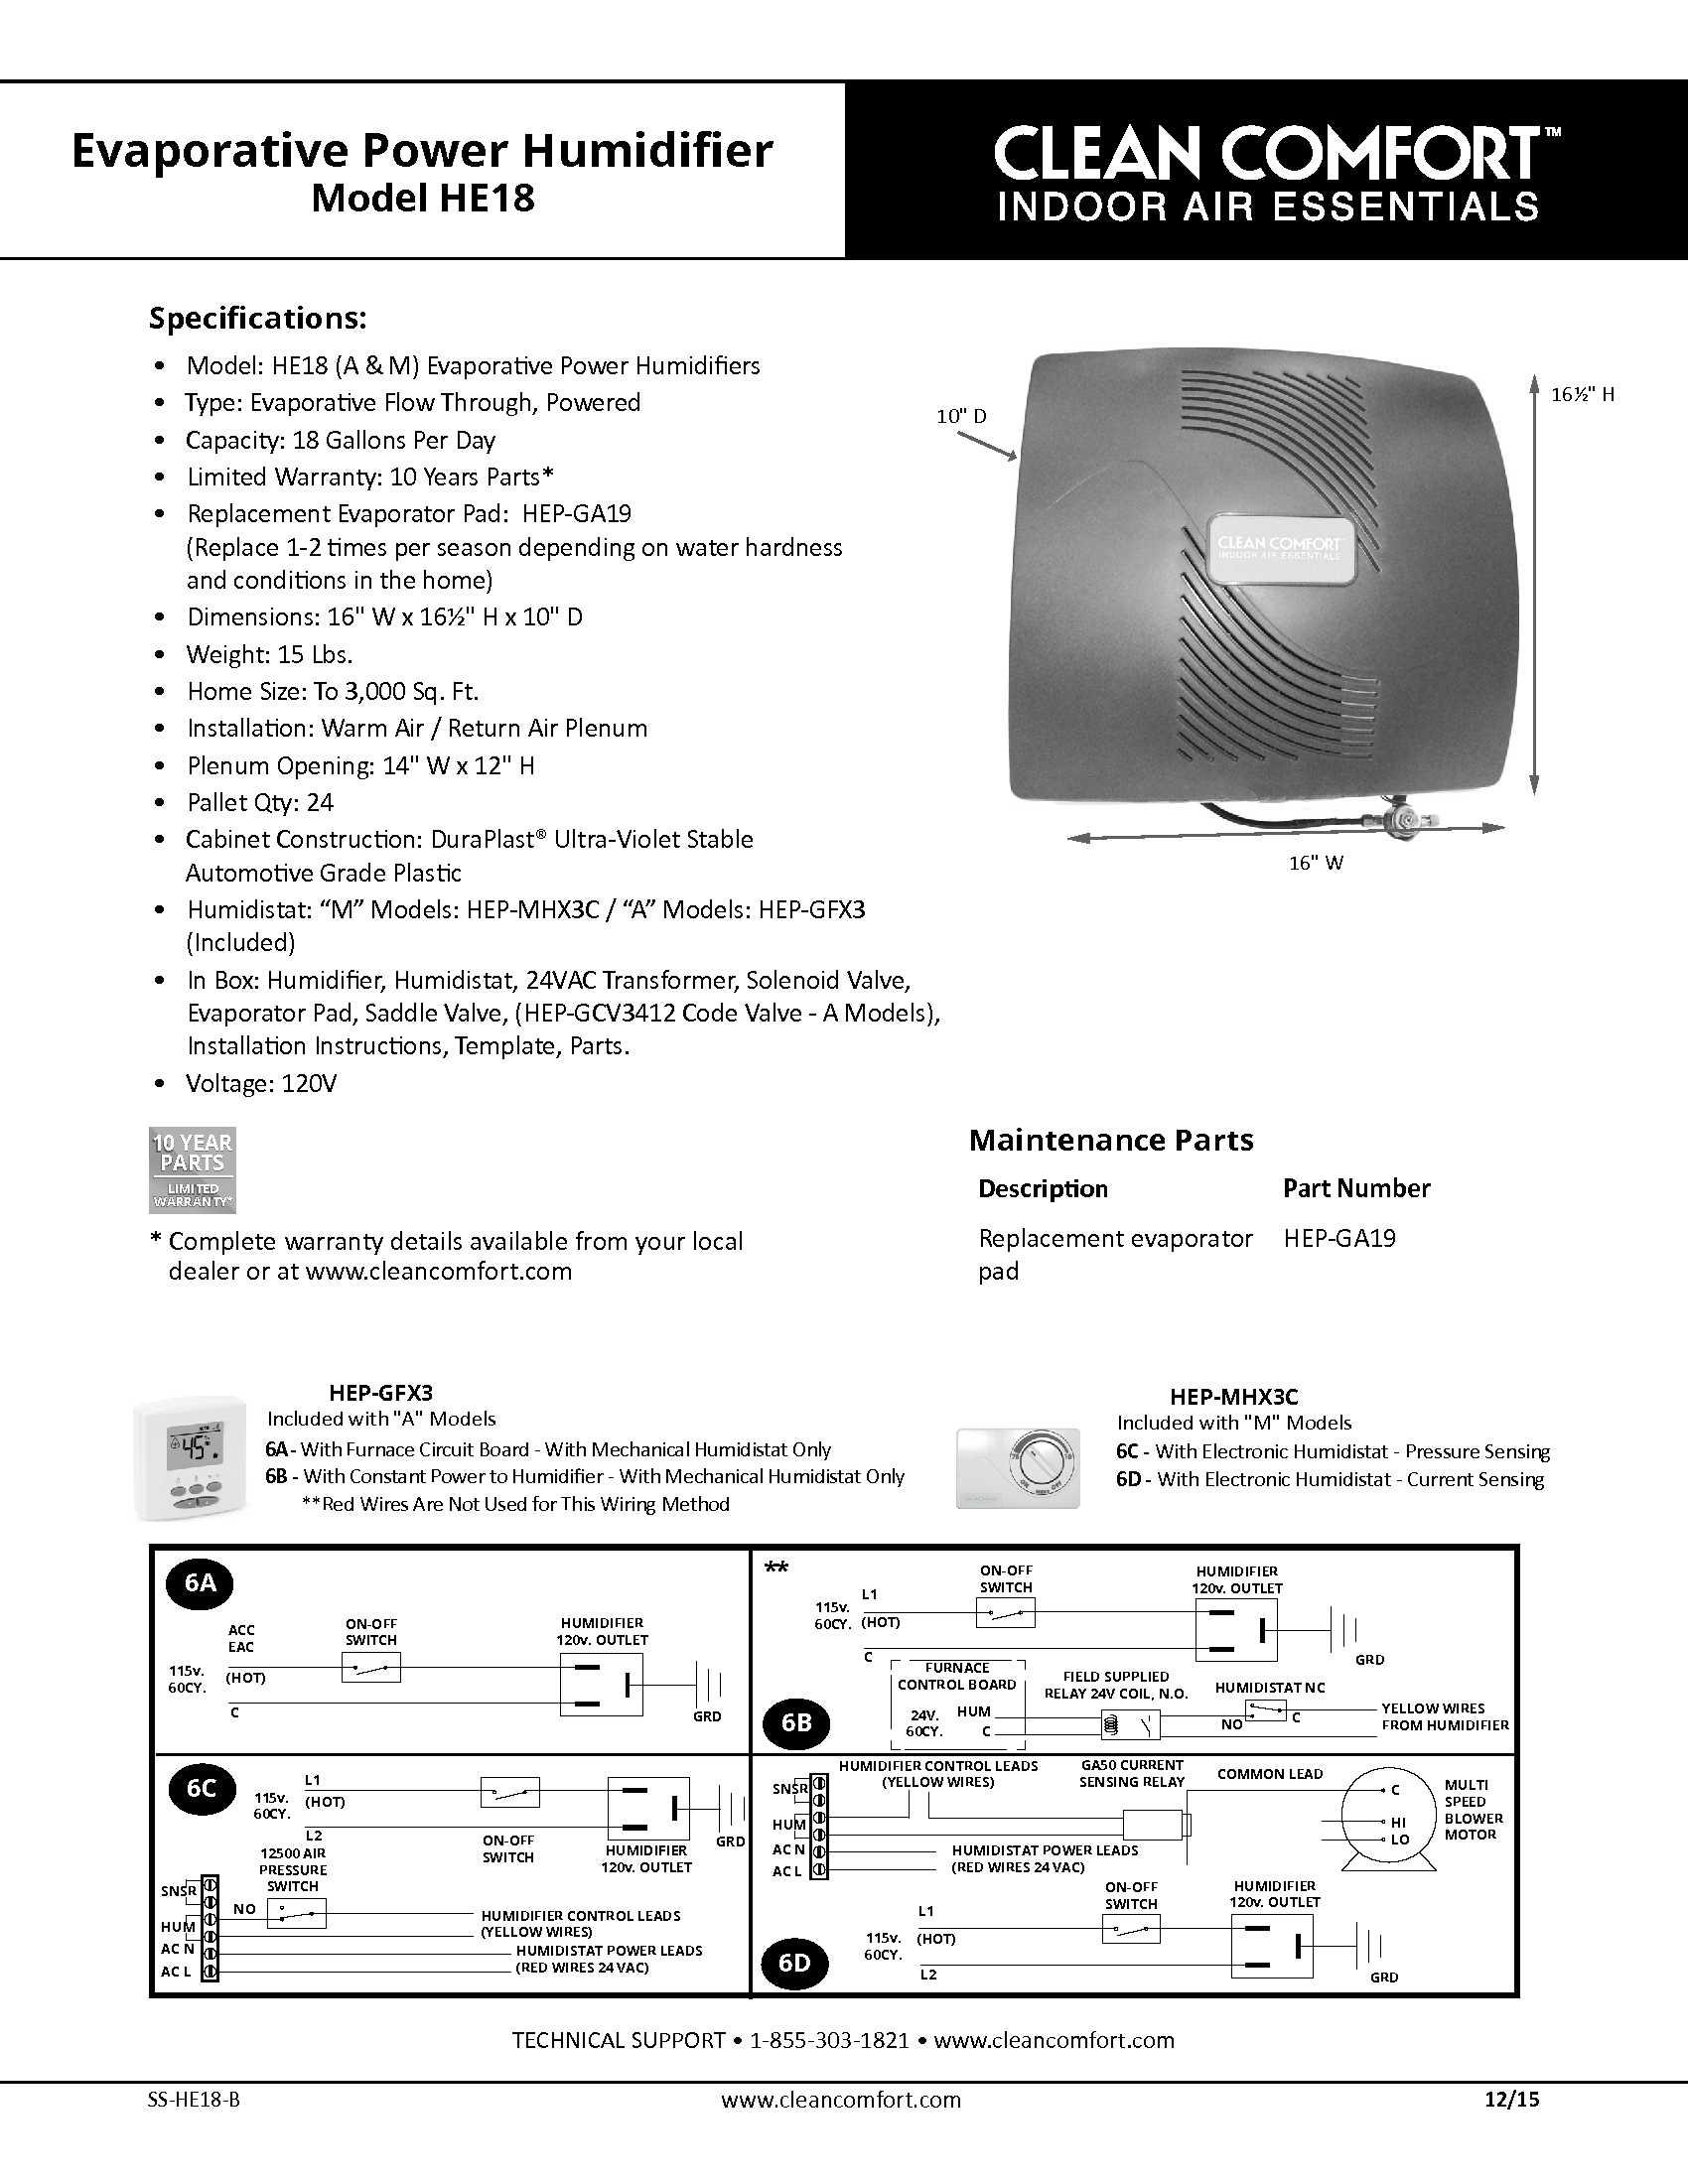 Goodman H18f Clean Comfort Humidifiers H18fm H18fa